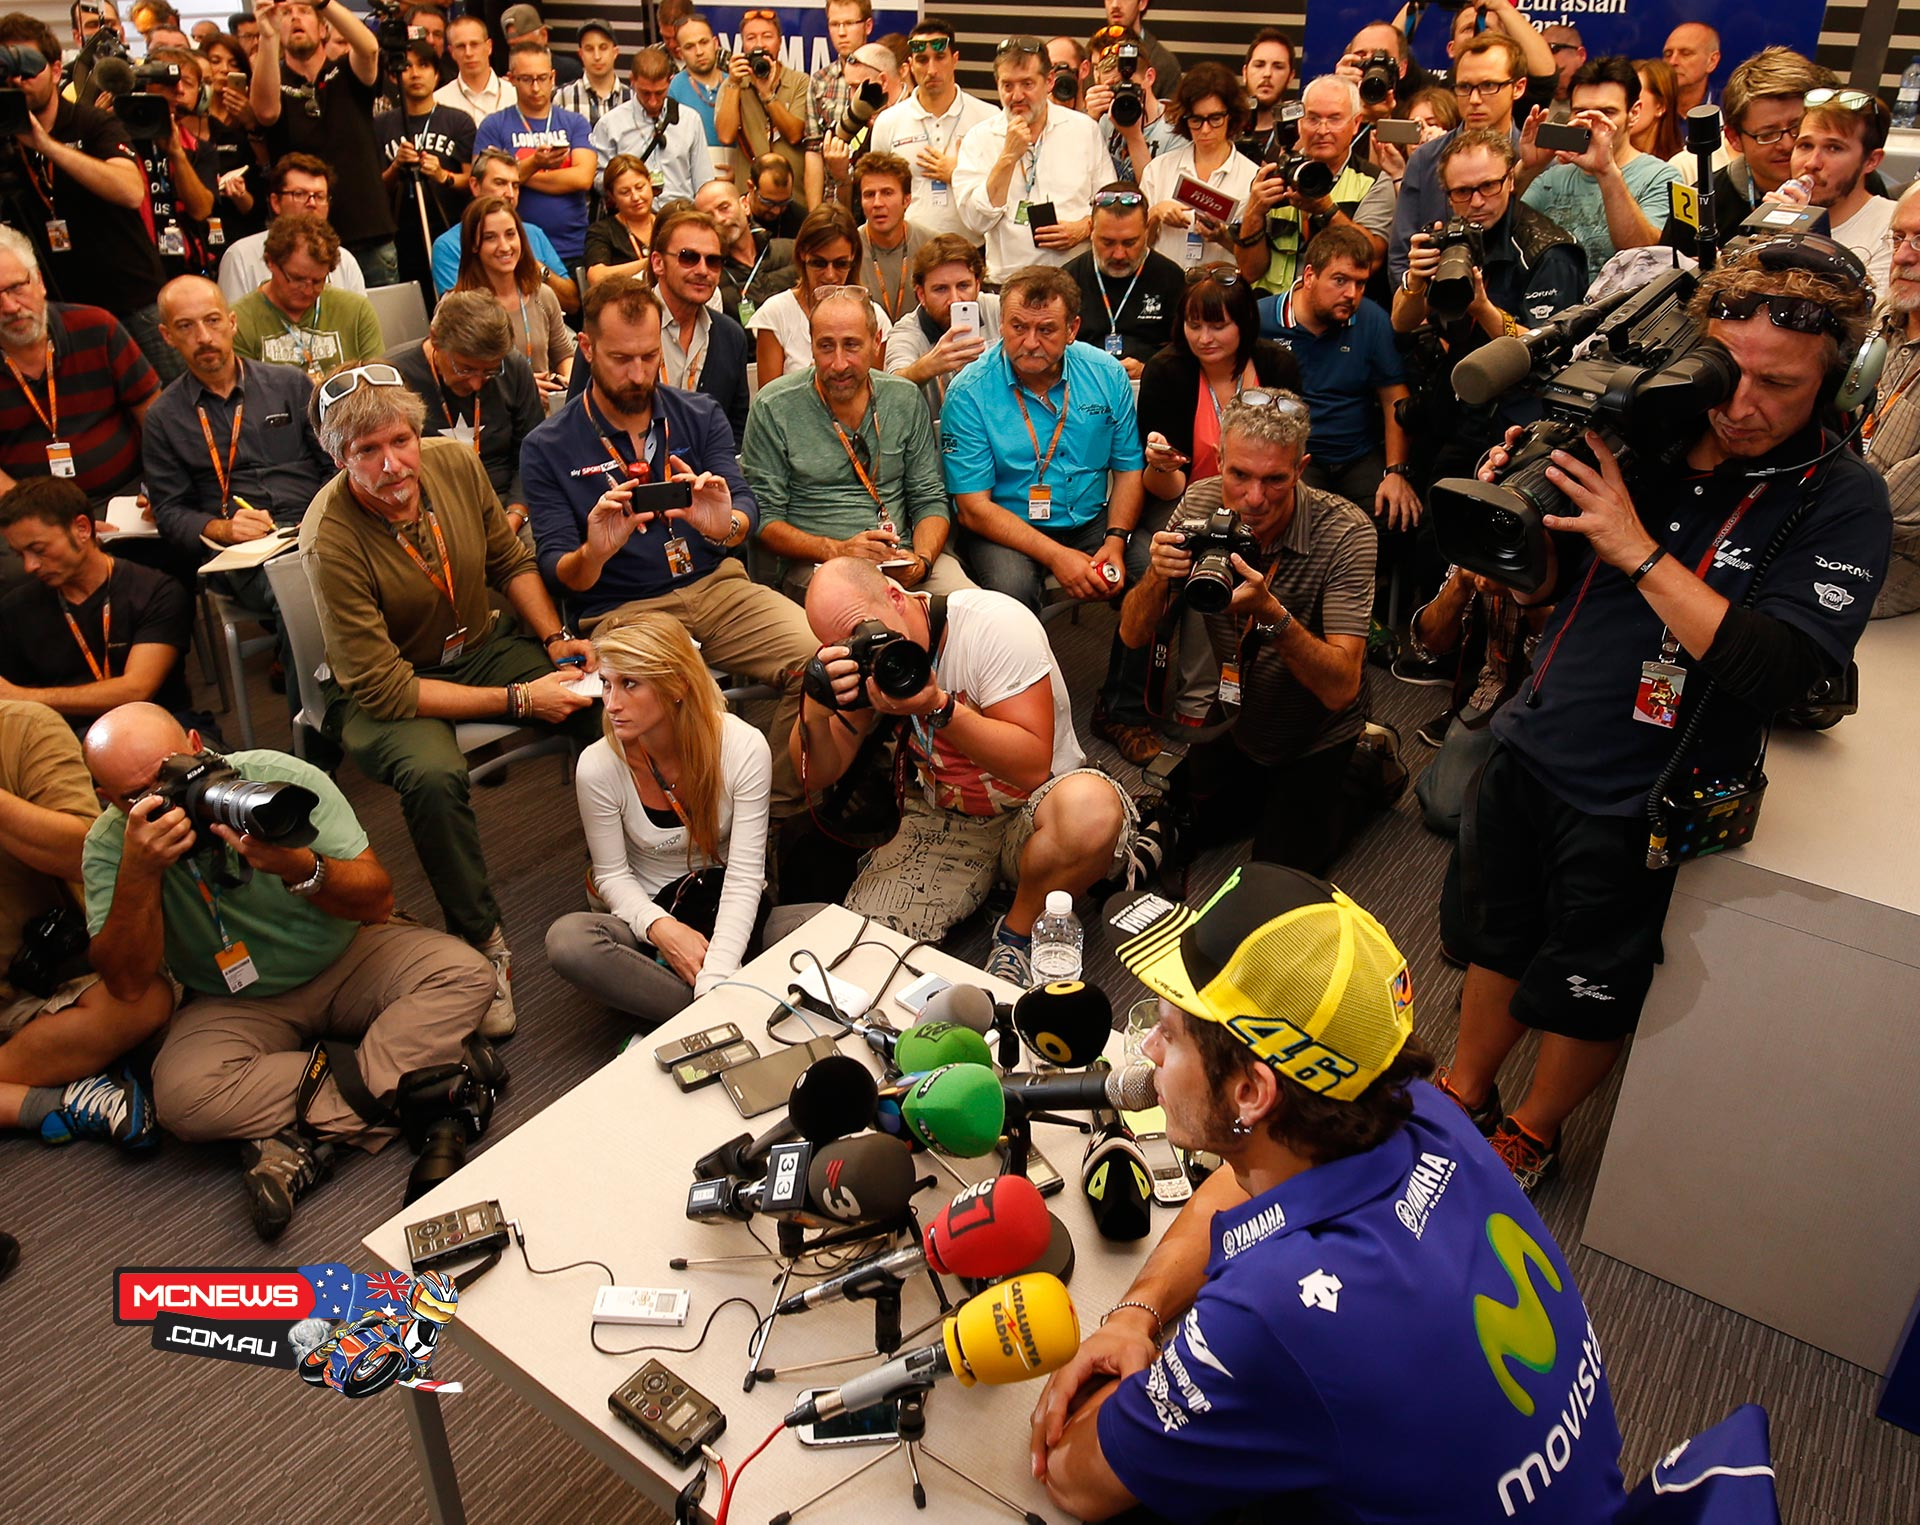 Valencia MotoGP 2015 - Valentino Rossi